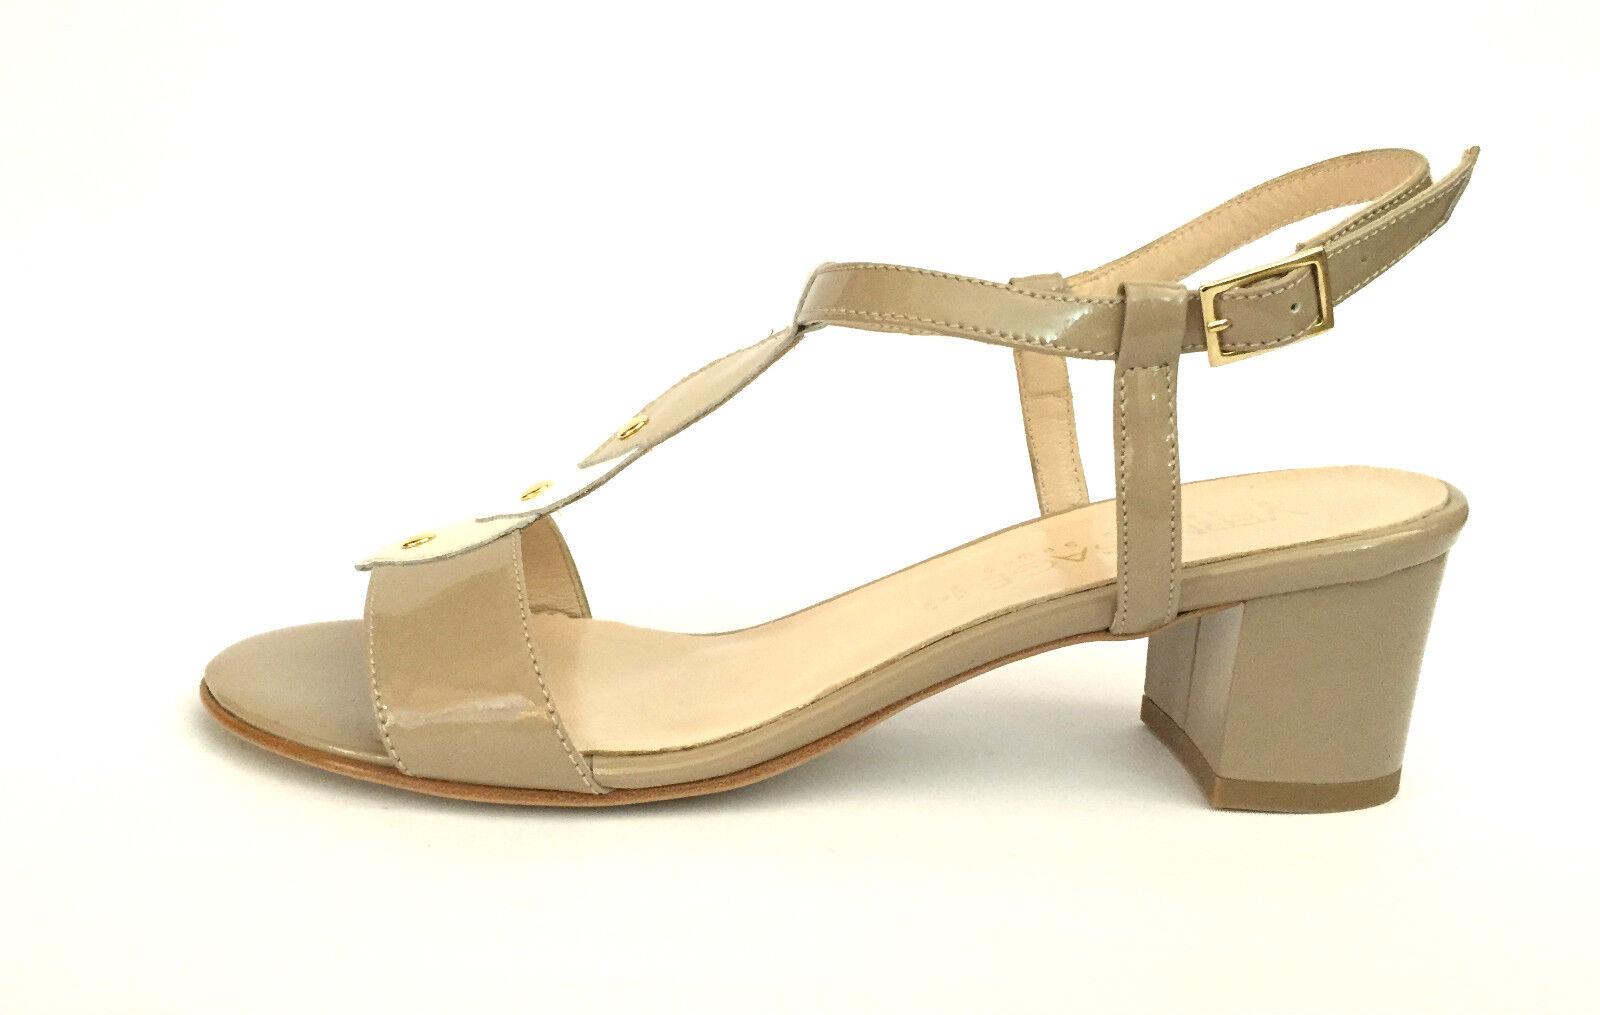 zapatos mujer VERNISSAGE SANDALI ELEGANTI 648 CHAMPAGNE ESTATE SCONTO 50%